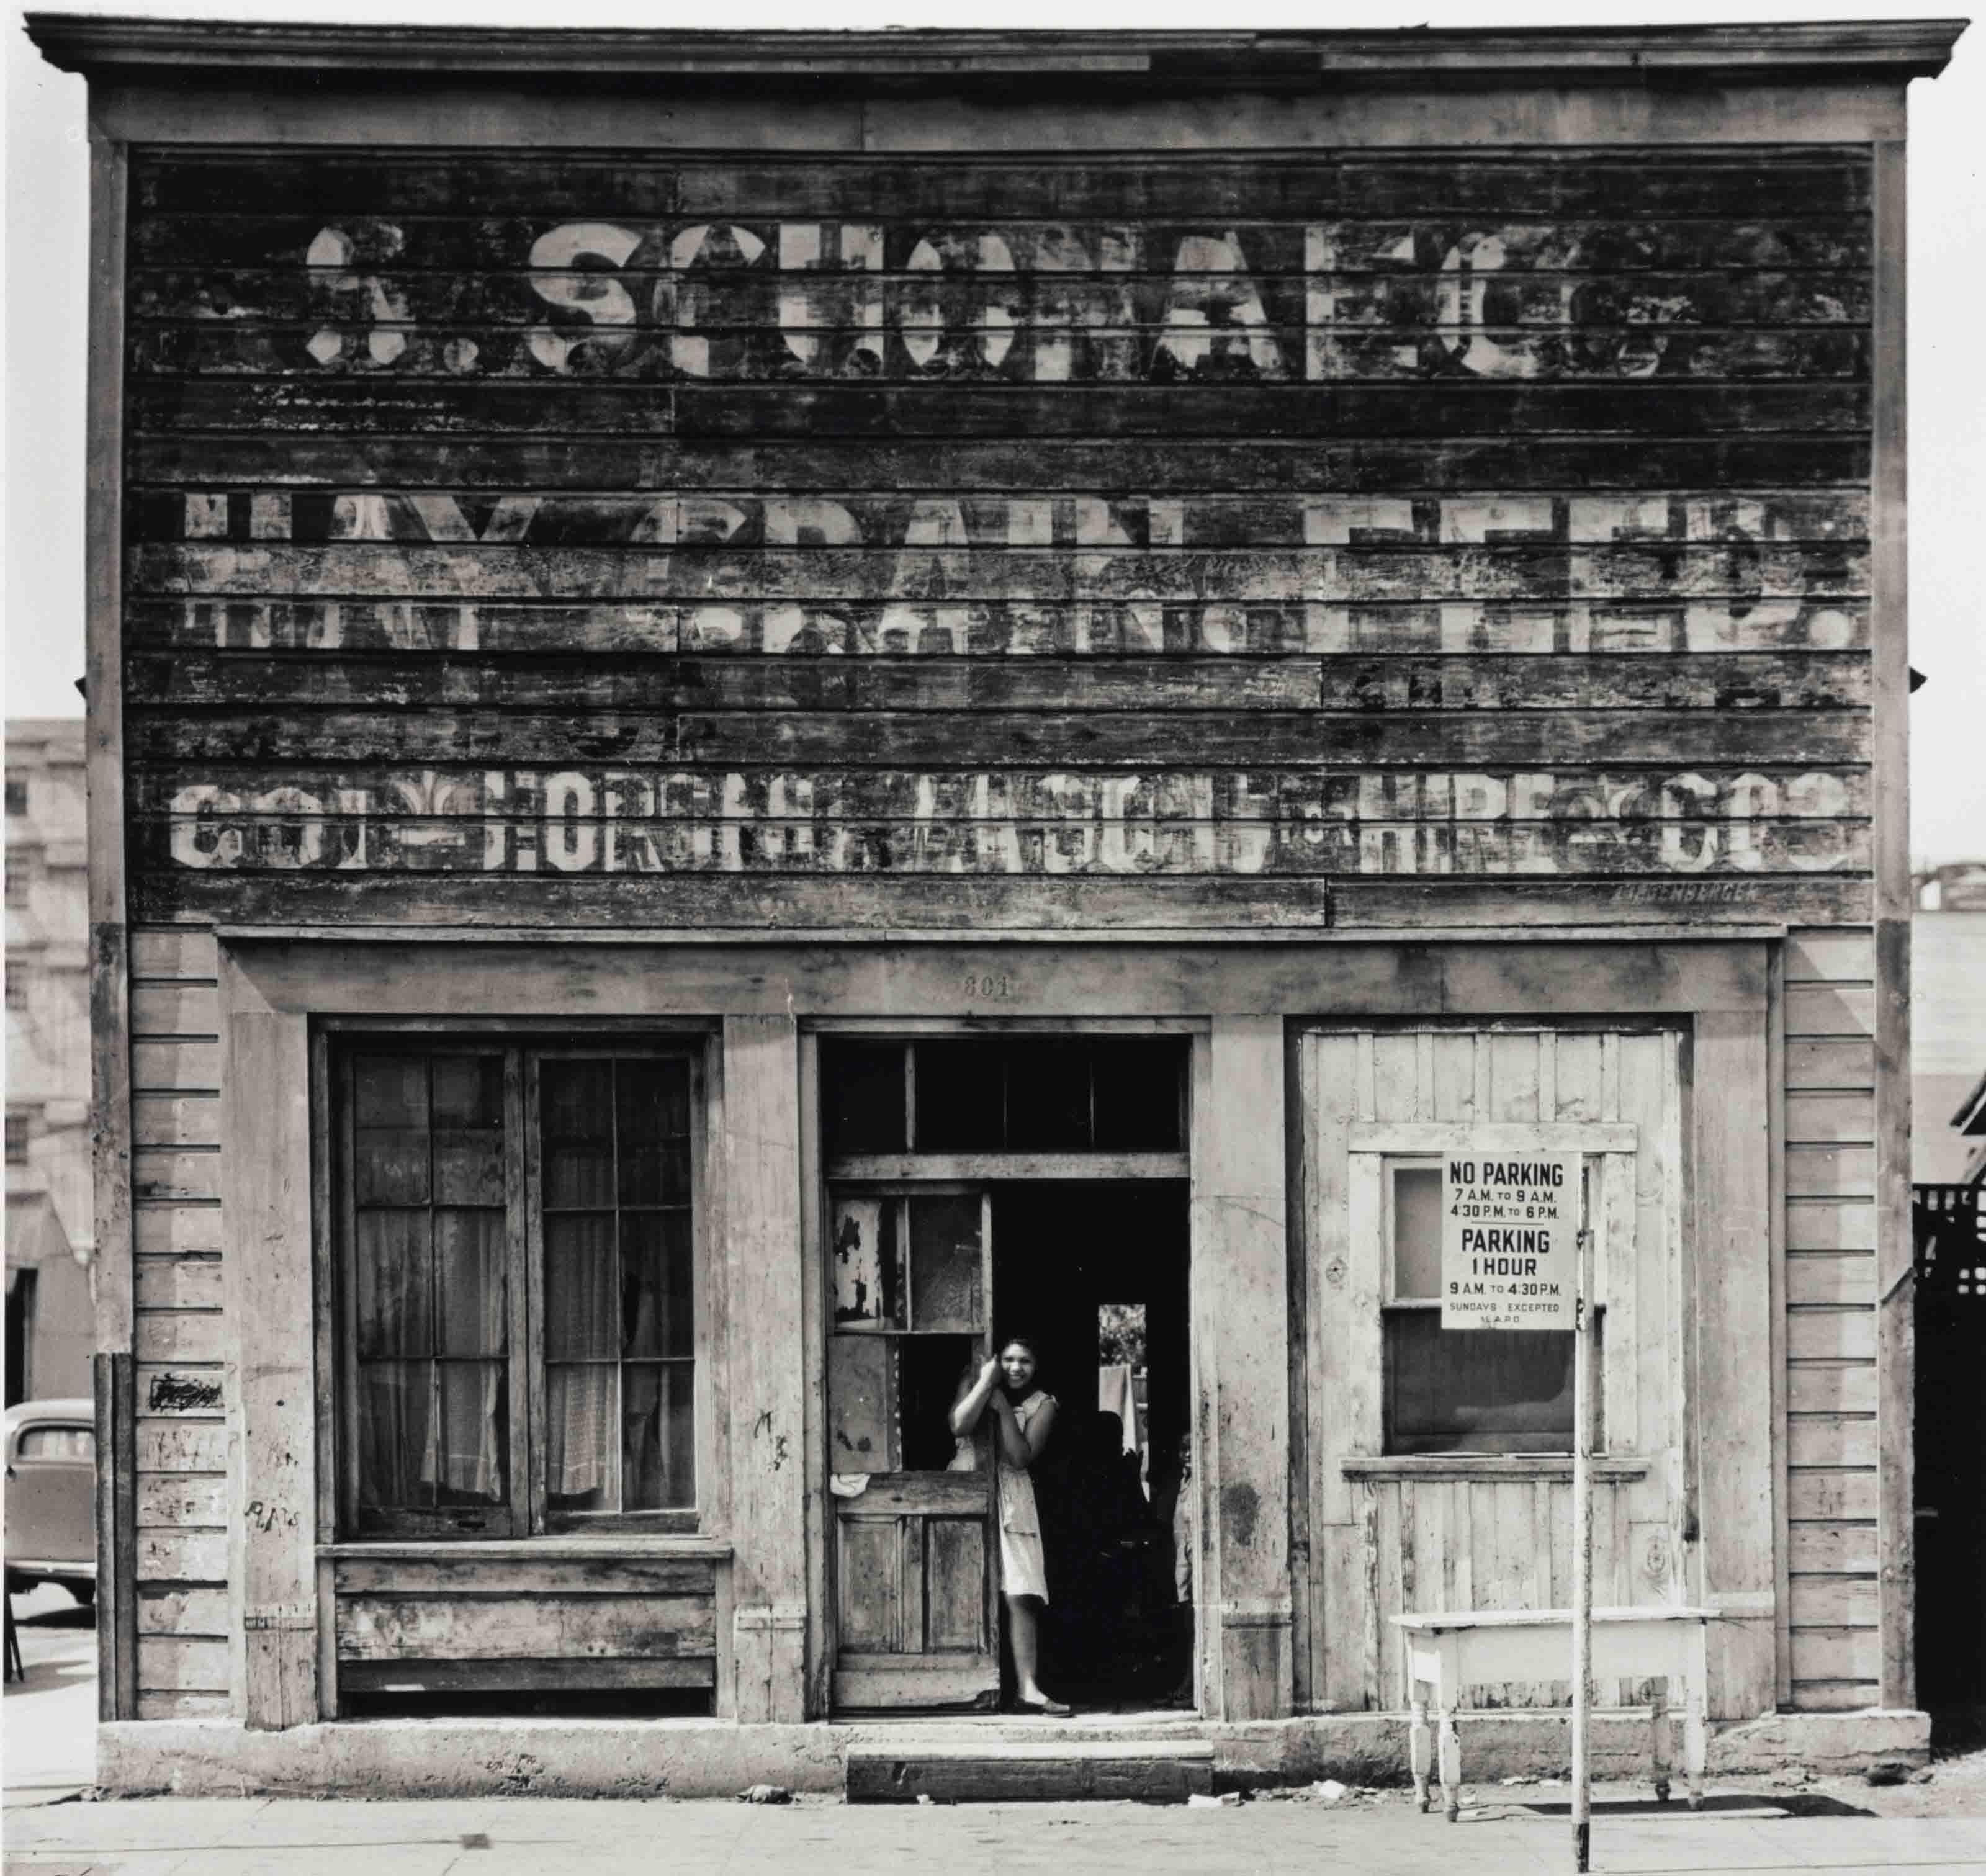 Girl in Doorway, Los Angeles, 1940s